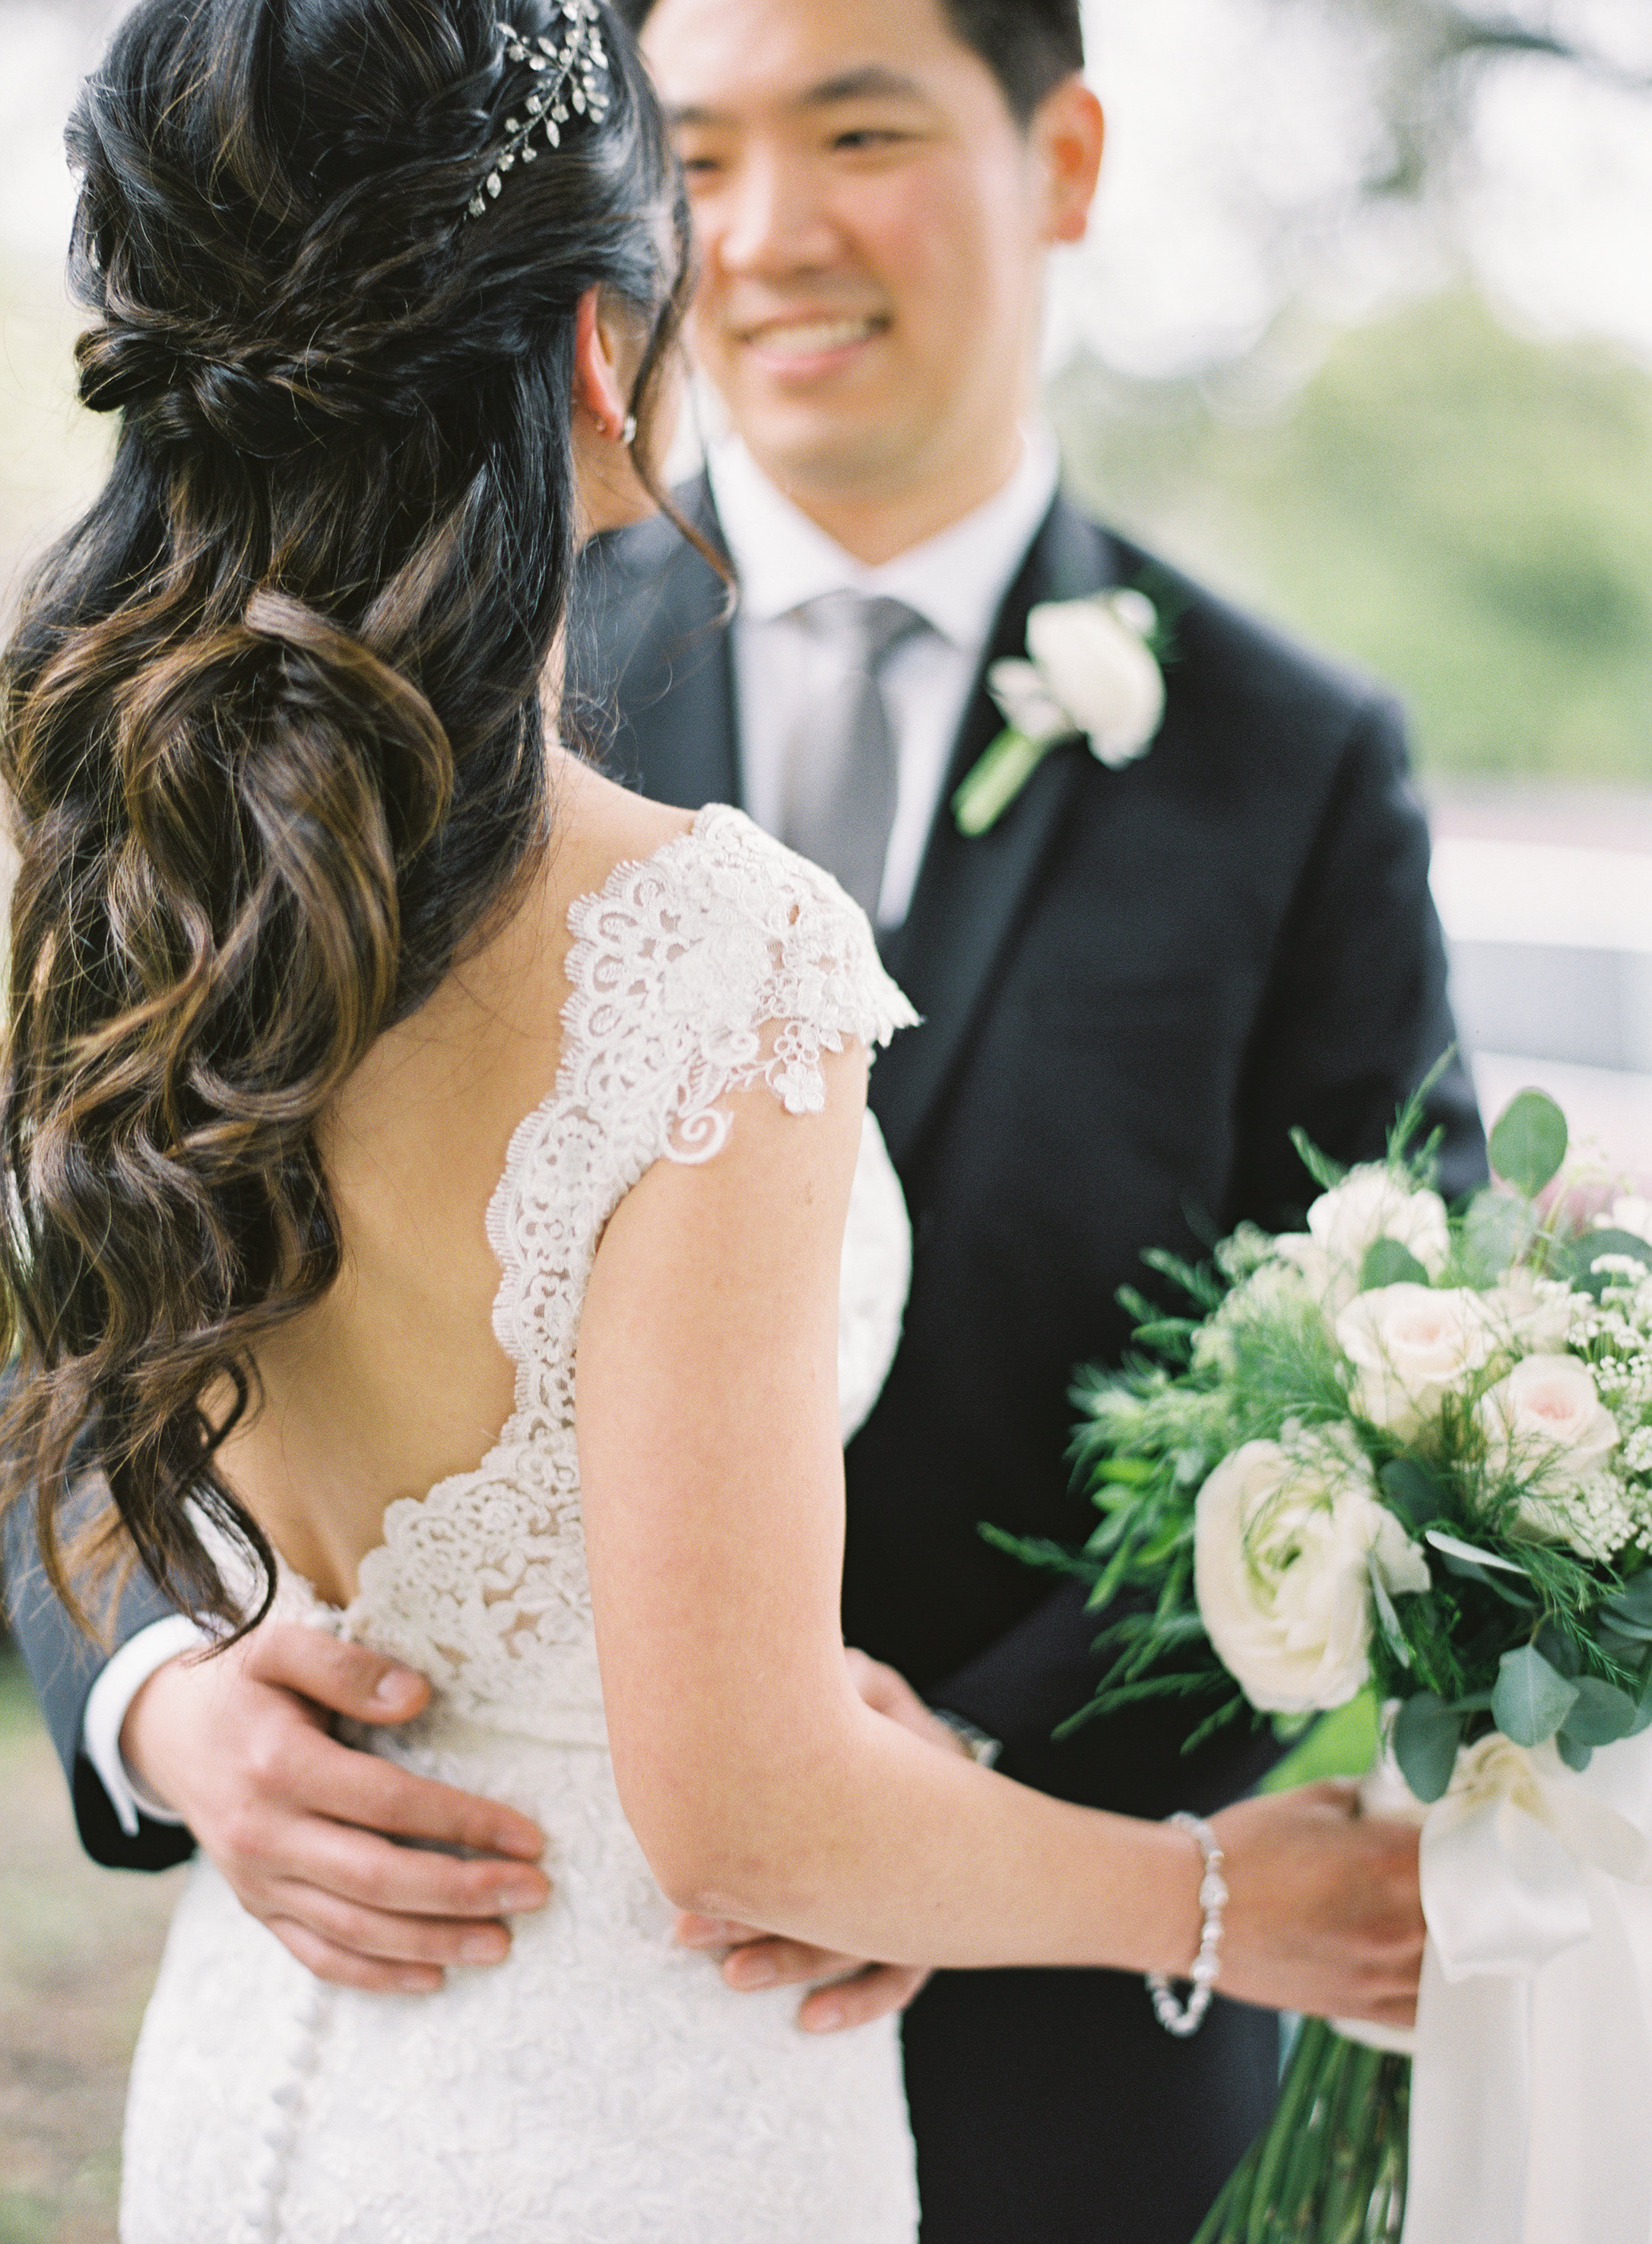 JA_Wedding_Jennifer_Aaron_002.jpg